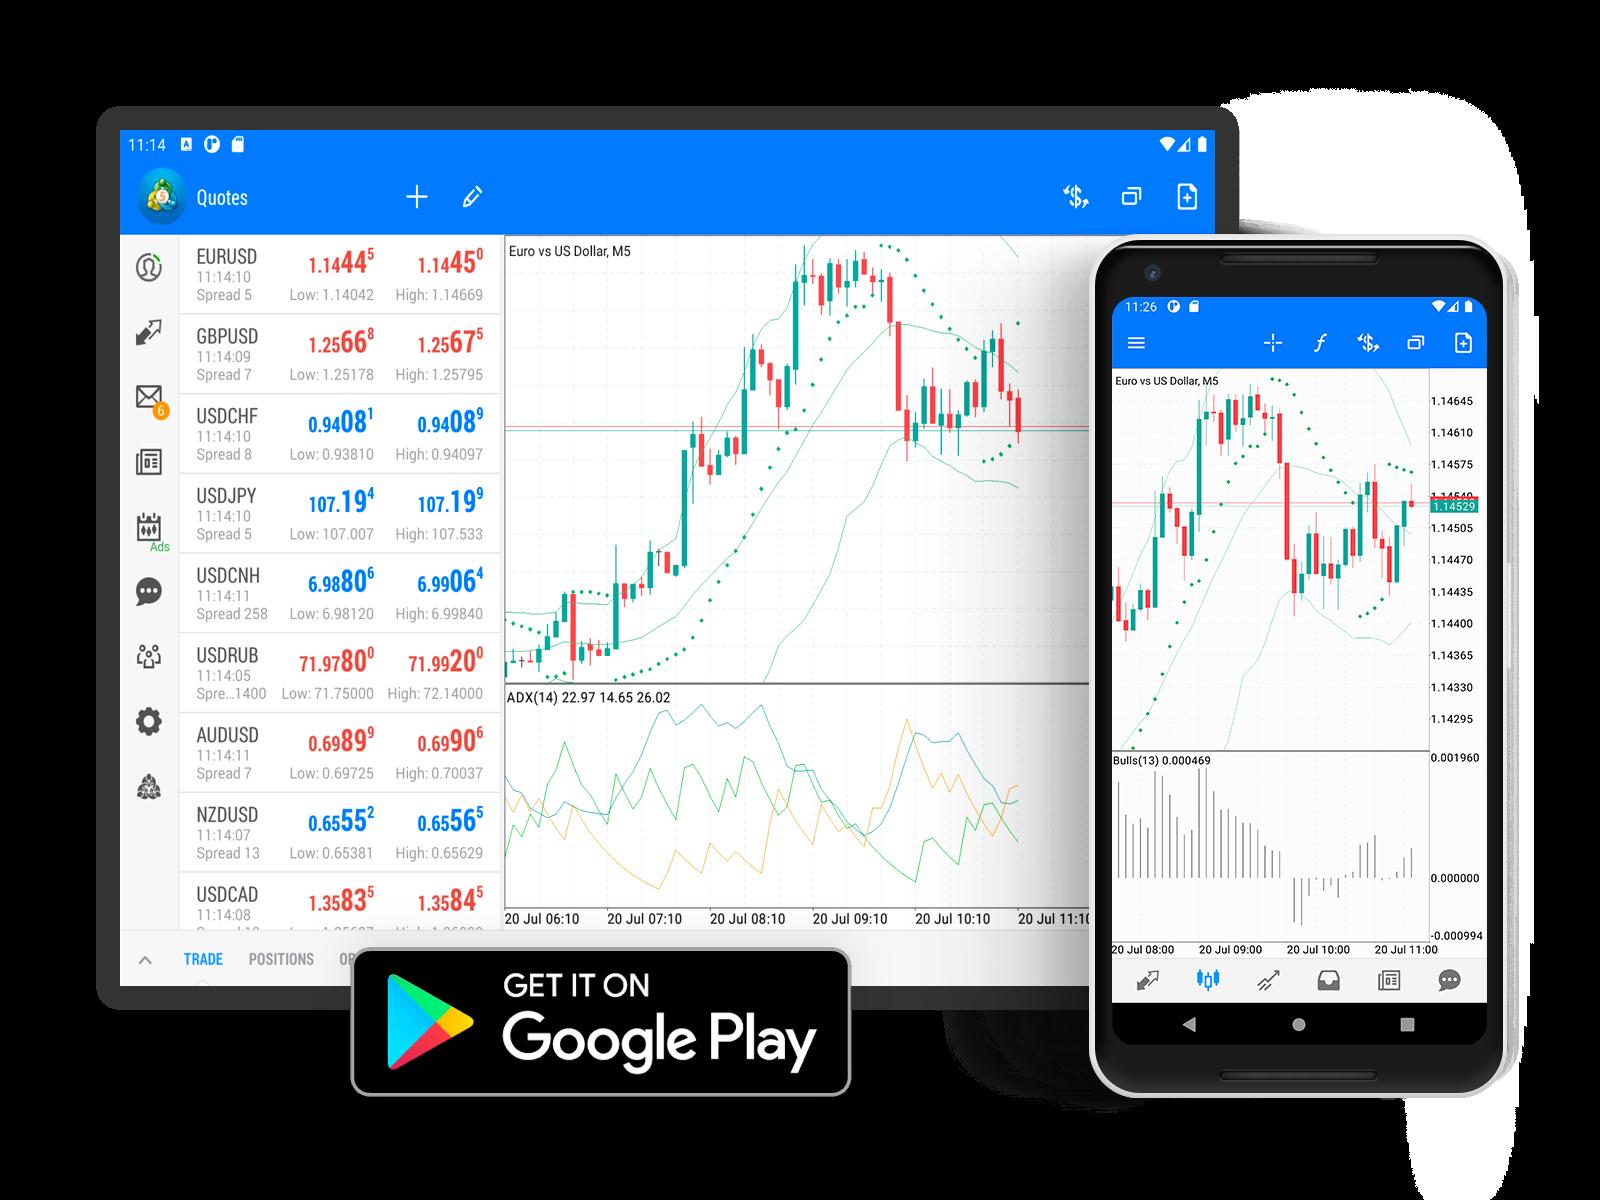 MetaTrader 5 Android build 2569: New chart colors